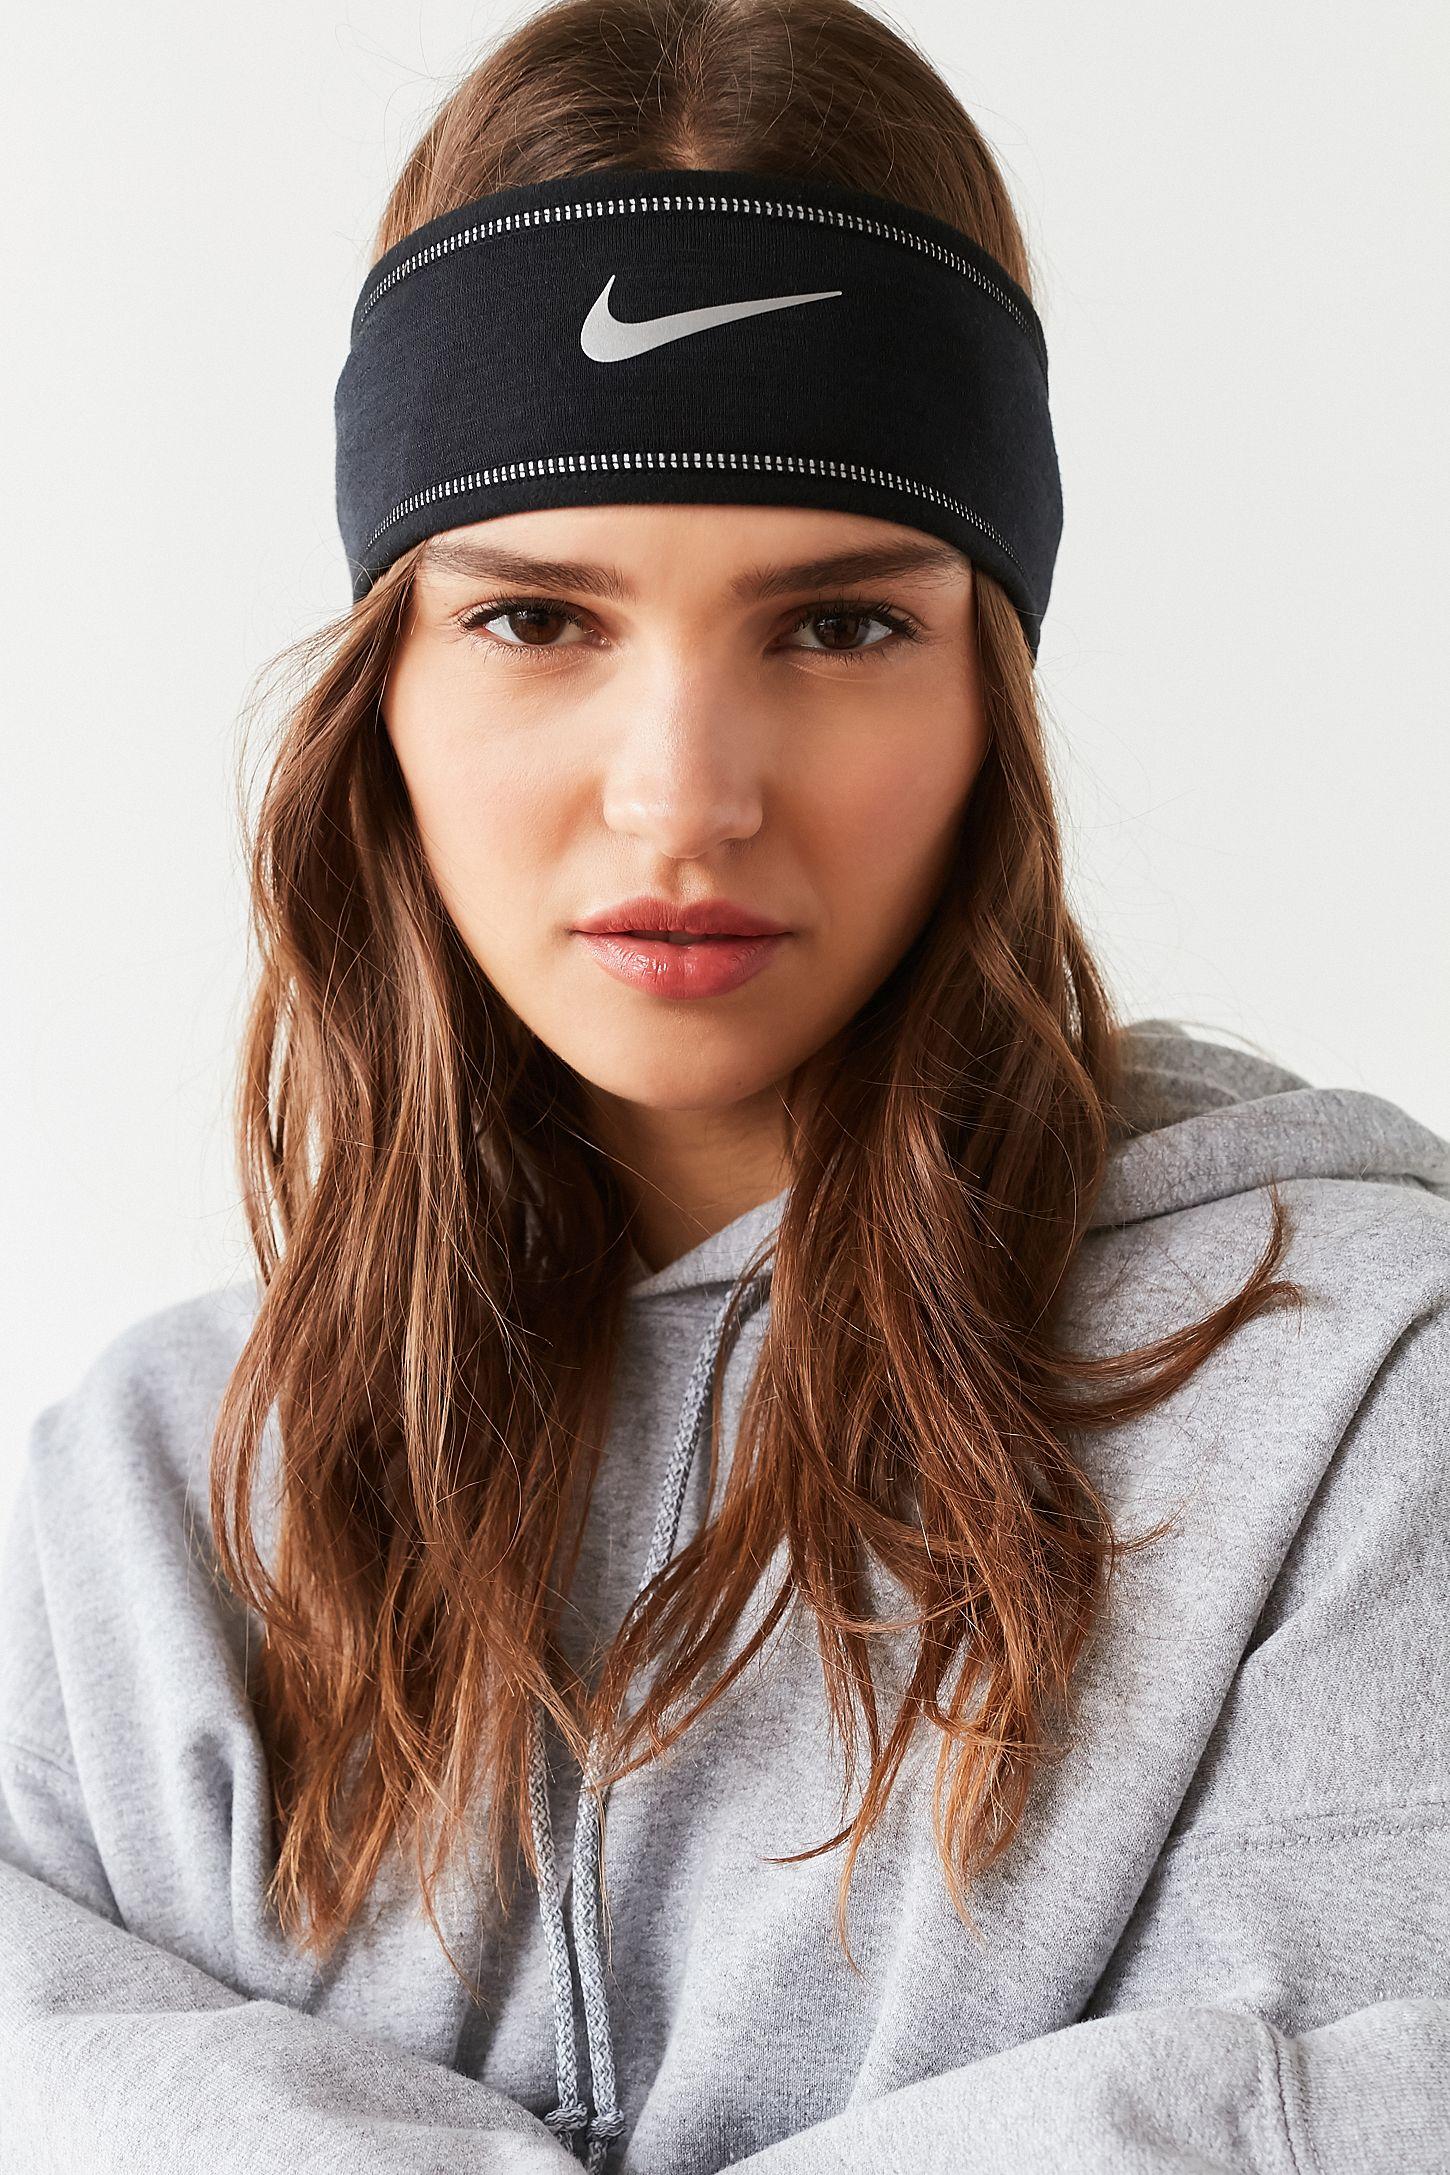 00c9f3ceaa85e Nike Running Headband